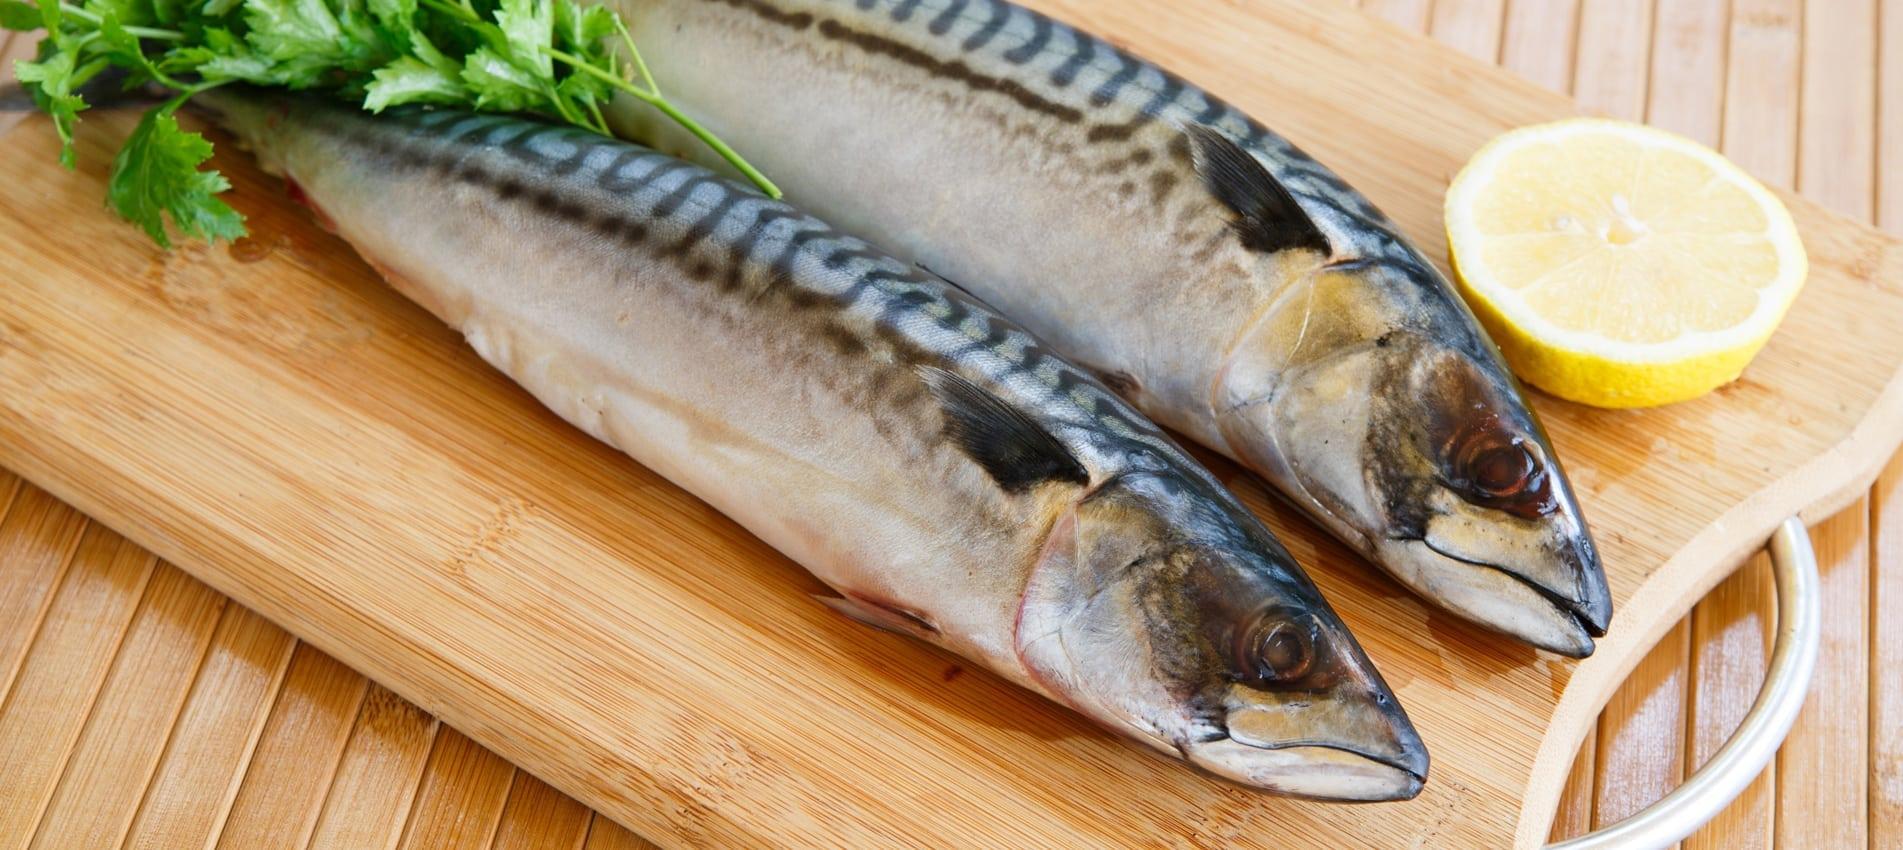 Cooking mackerel stuffed with salsa verde - ESSE